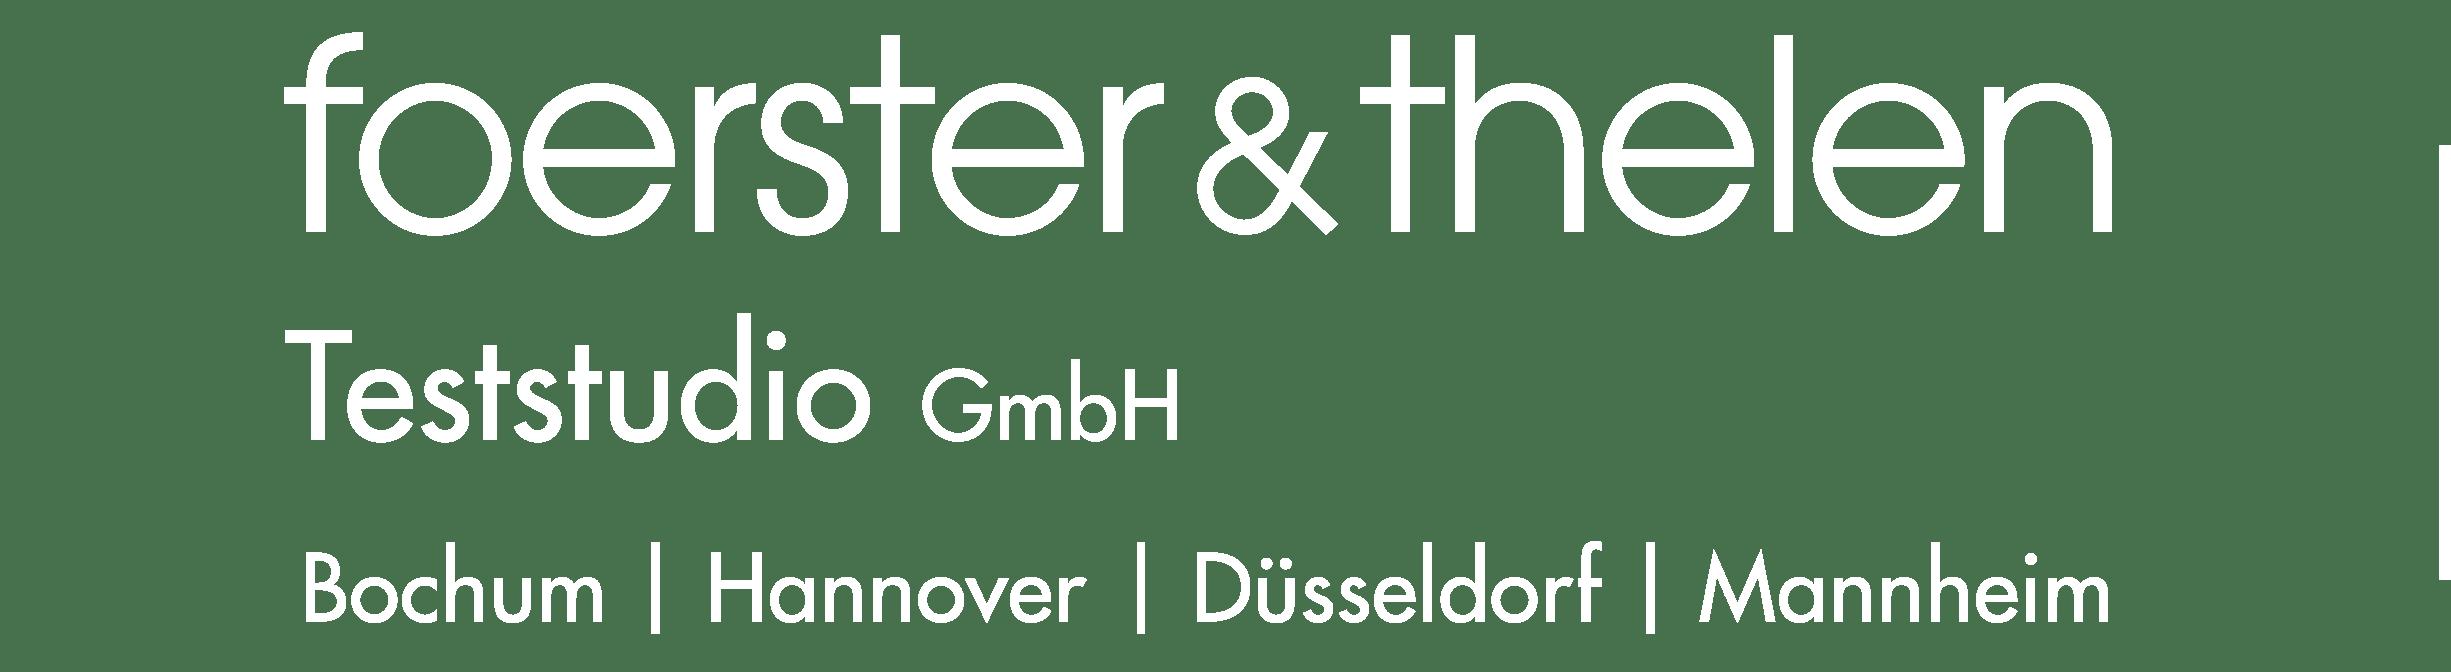 Foerster & Thelen Teststudio GmbH